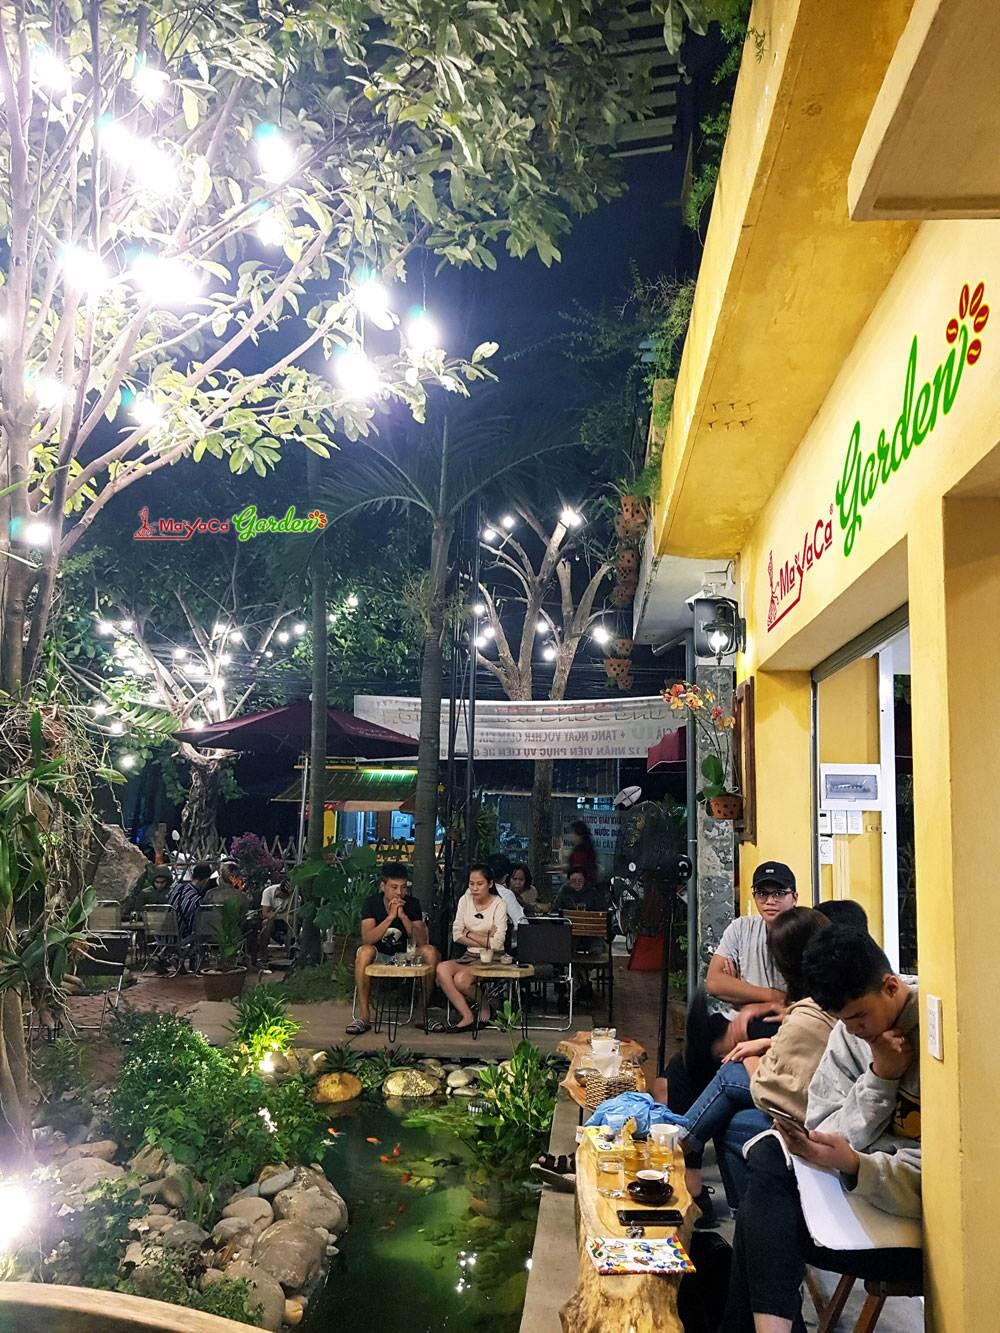 mayaca-garden-4